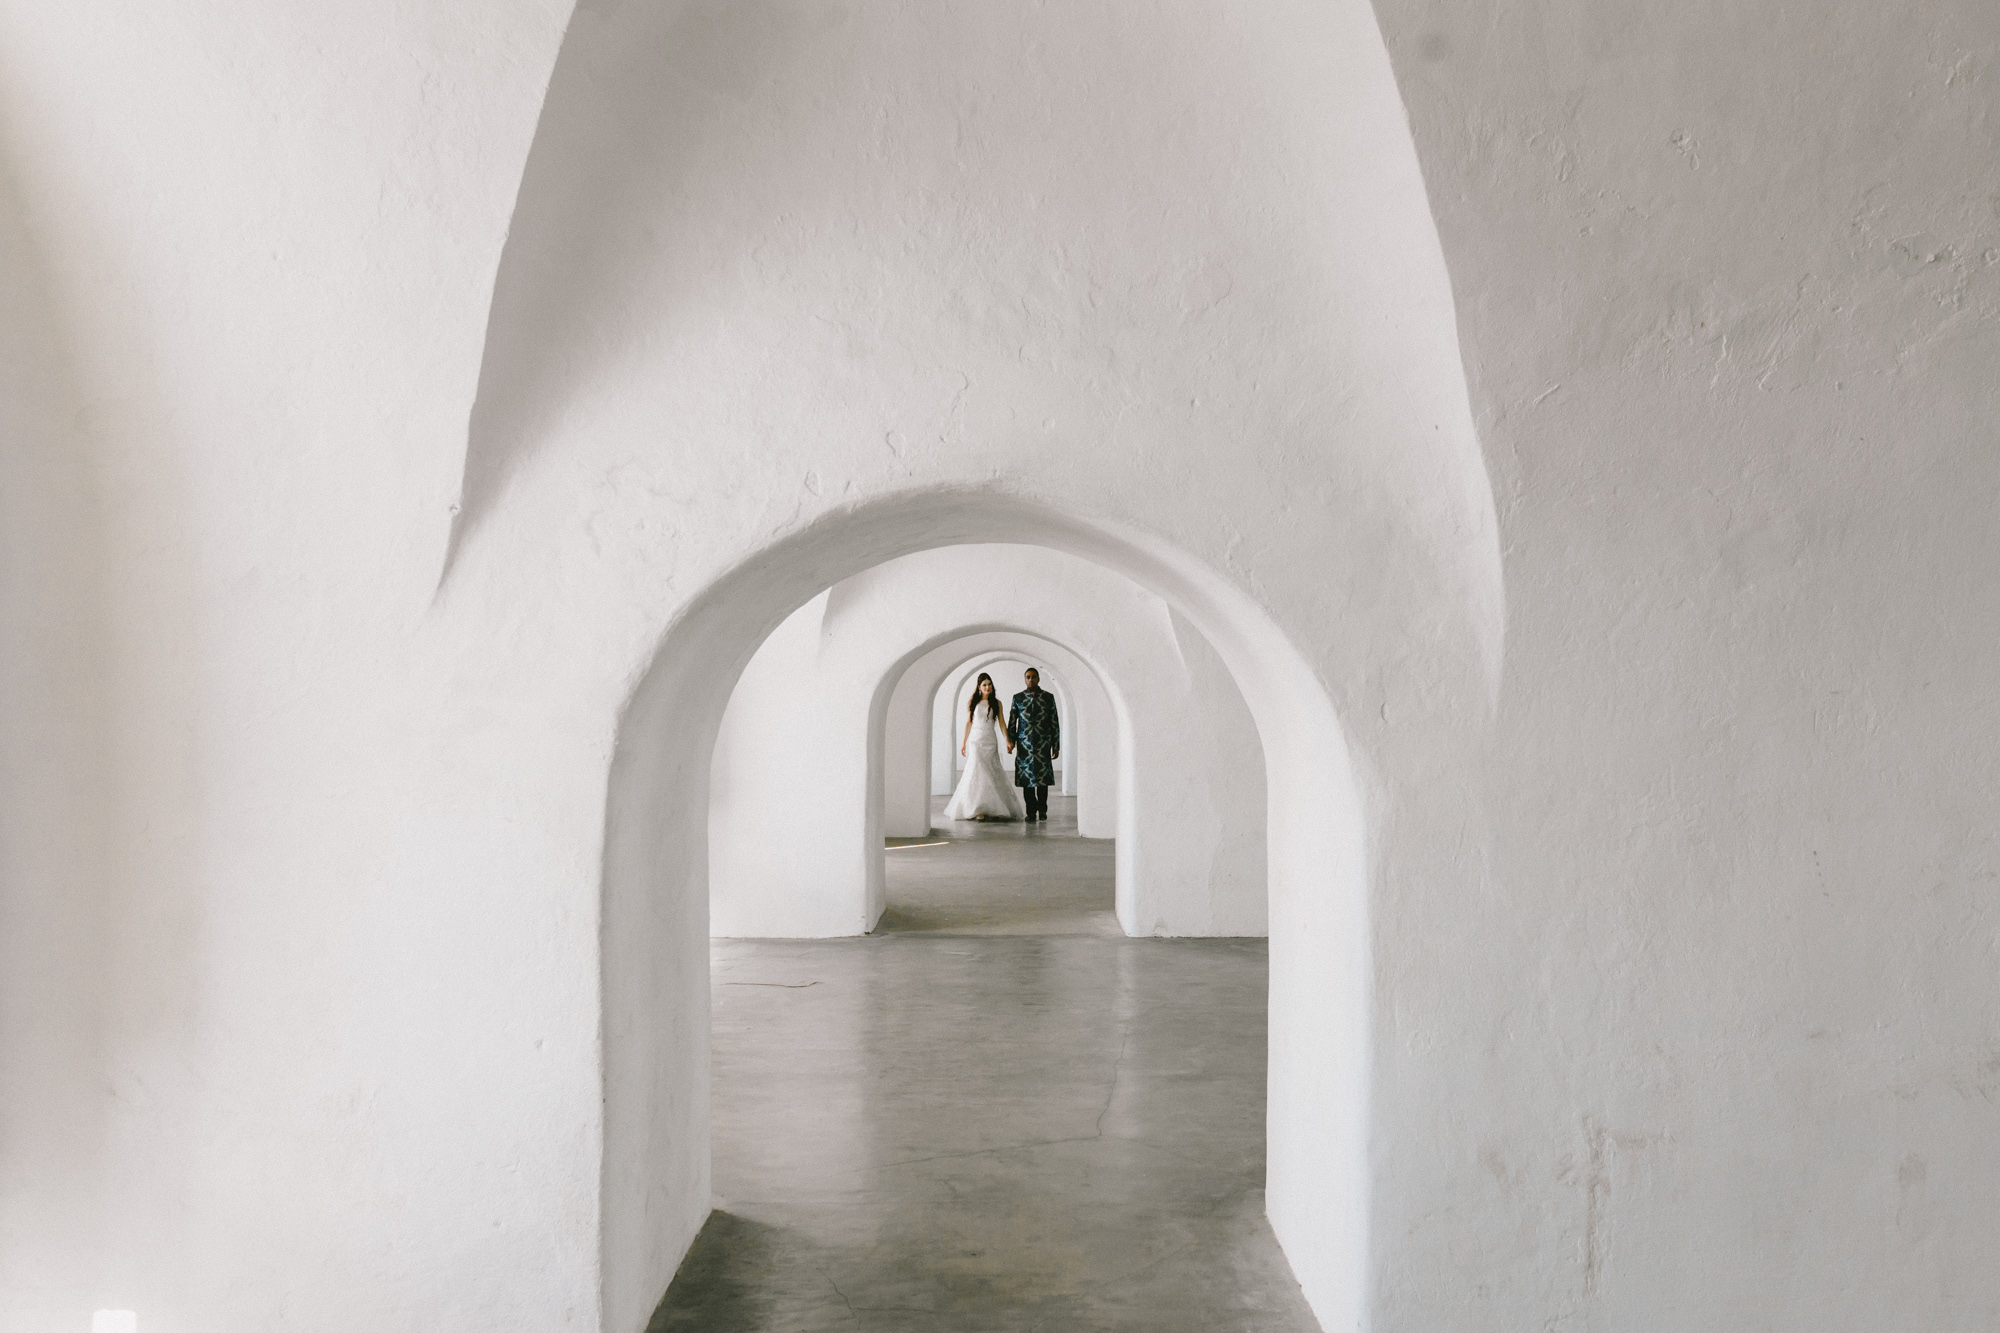 Puerto Rico Wedding Photography Destination Photographer Boris Zaretsky San Juan PR Casino Antiguo La Concha IMG_0154.jpg